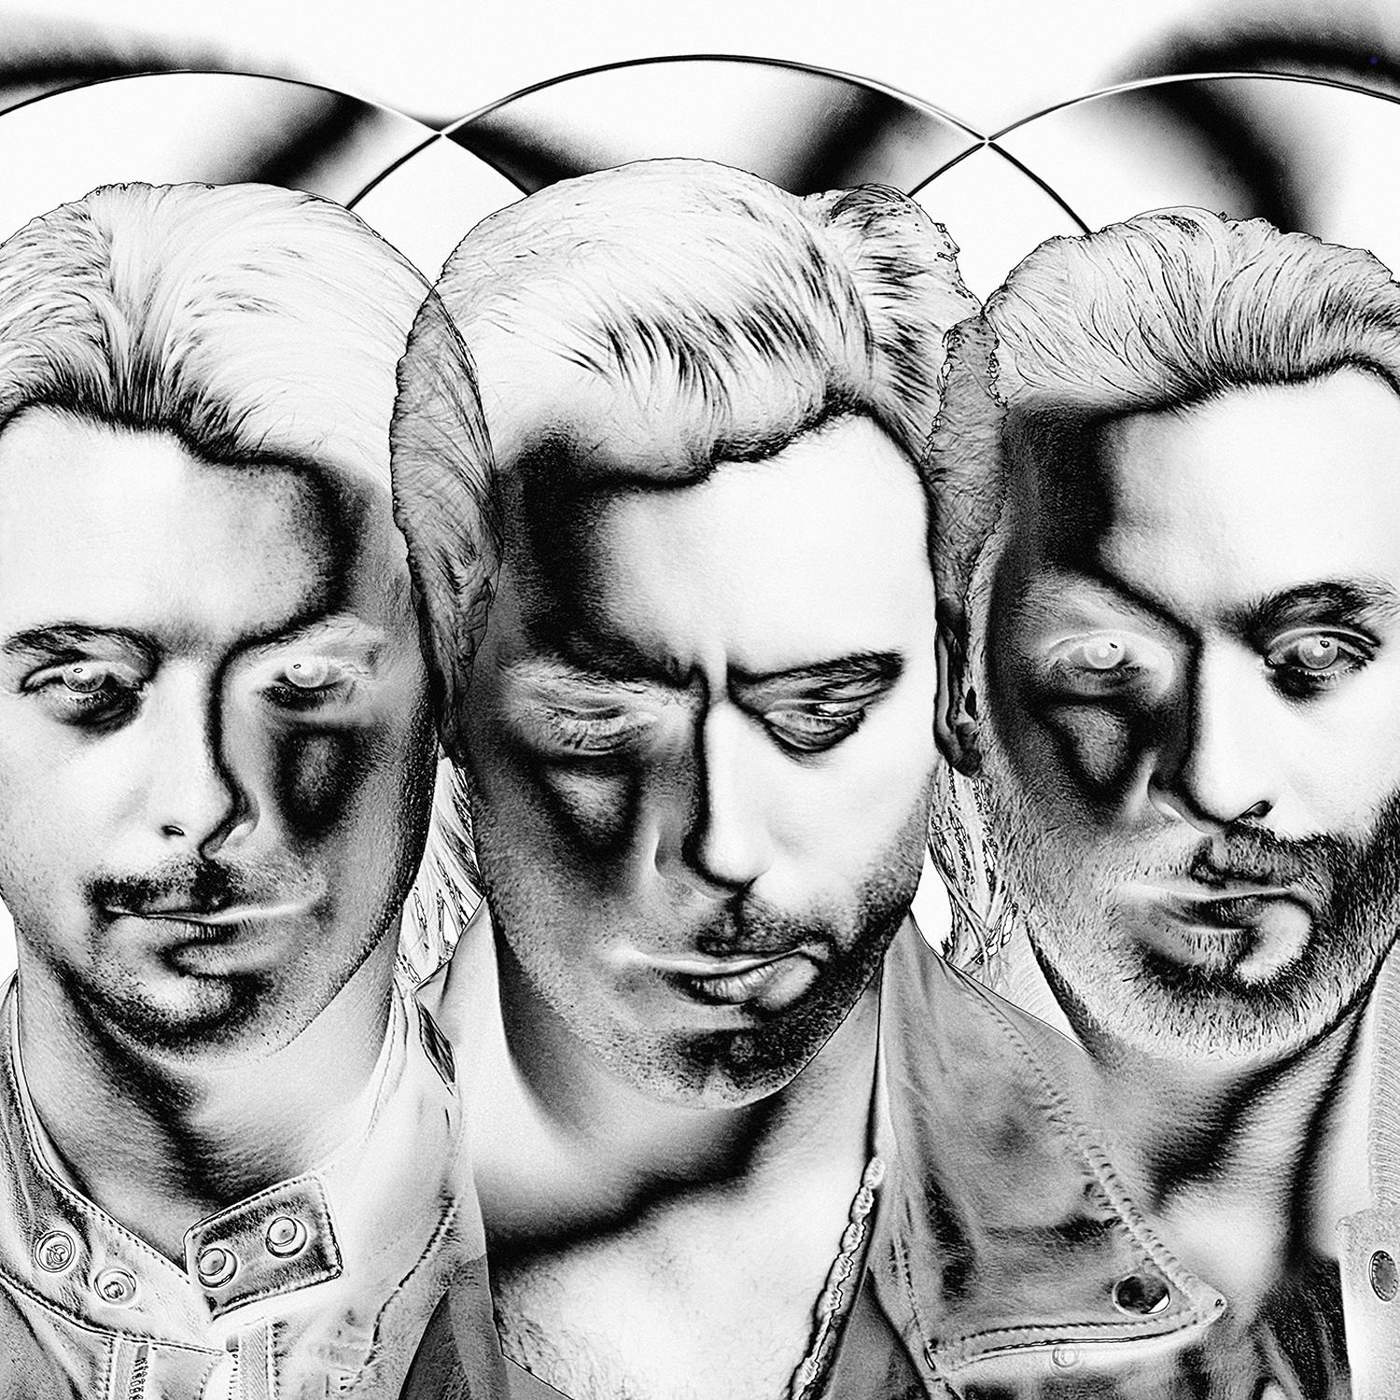 Swedish House Mafia - Until Now Cover